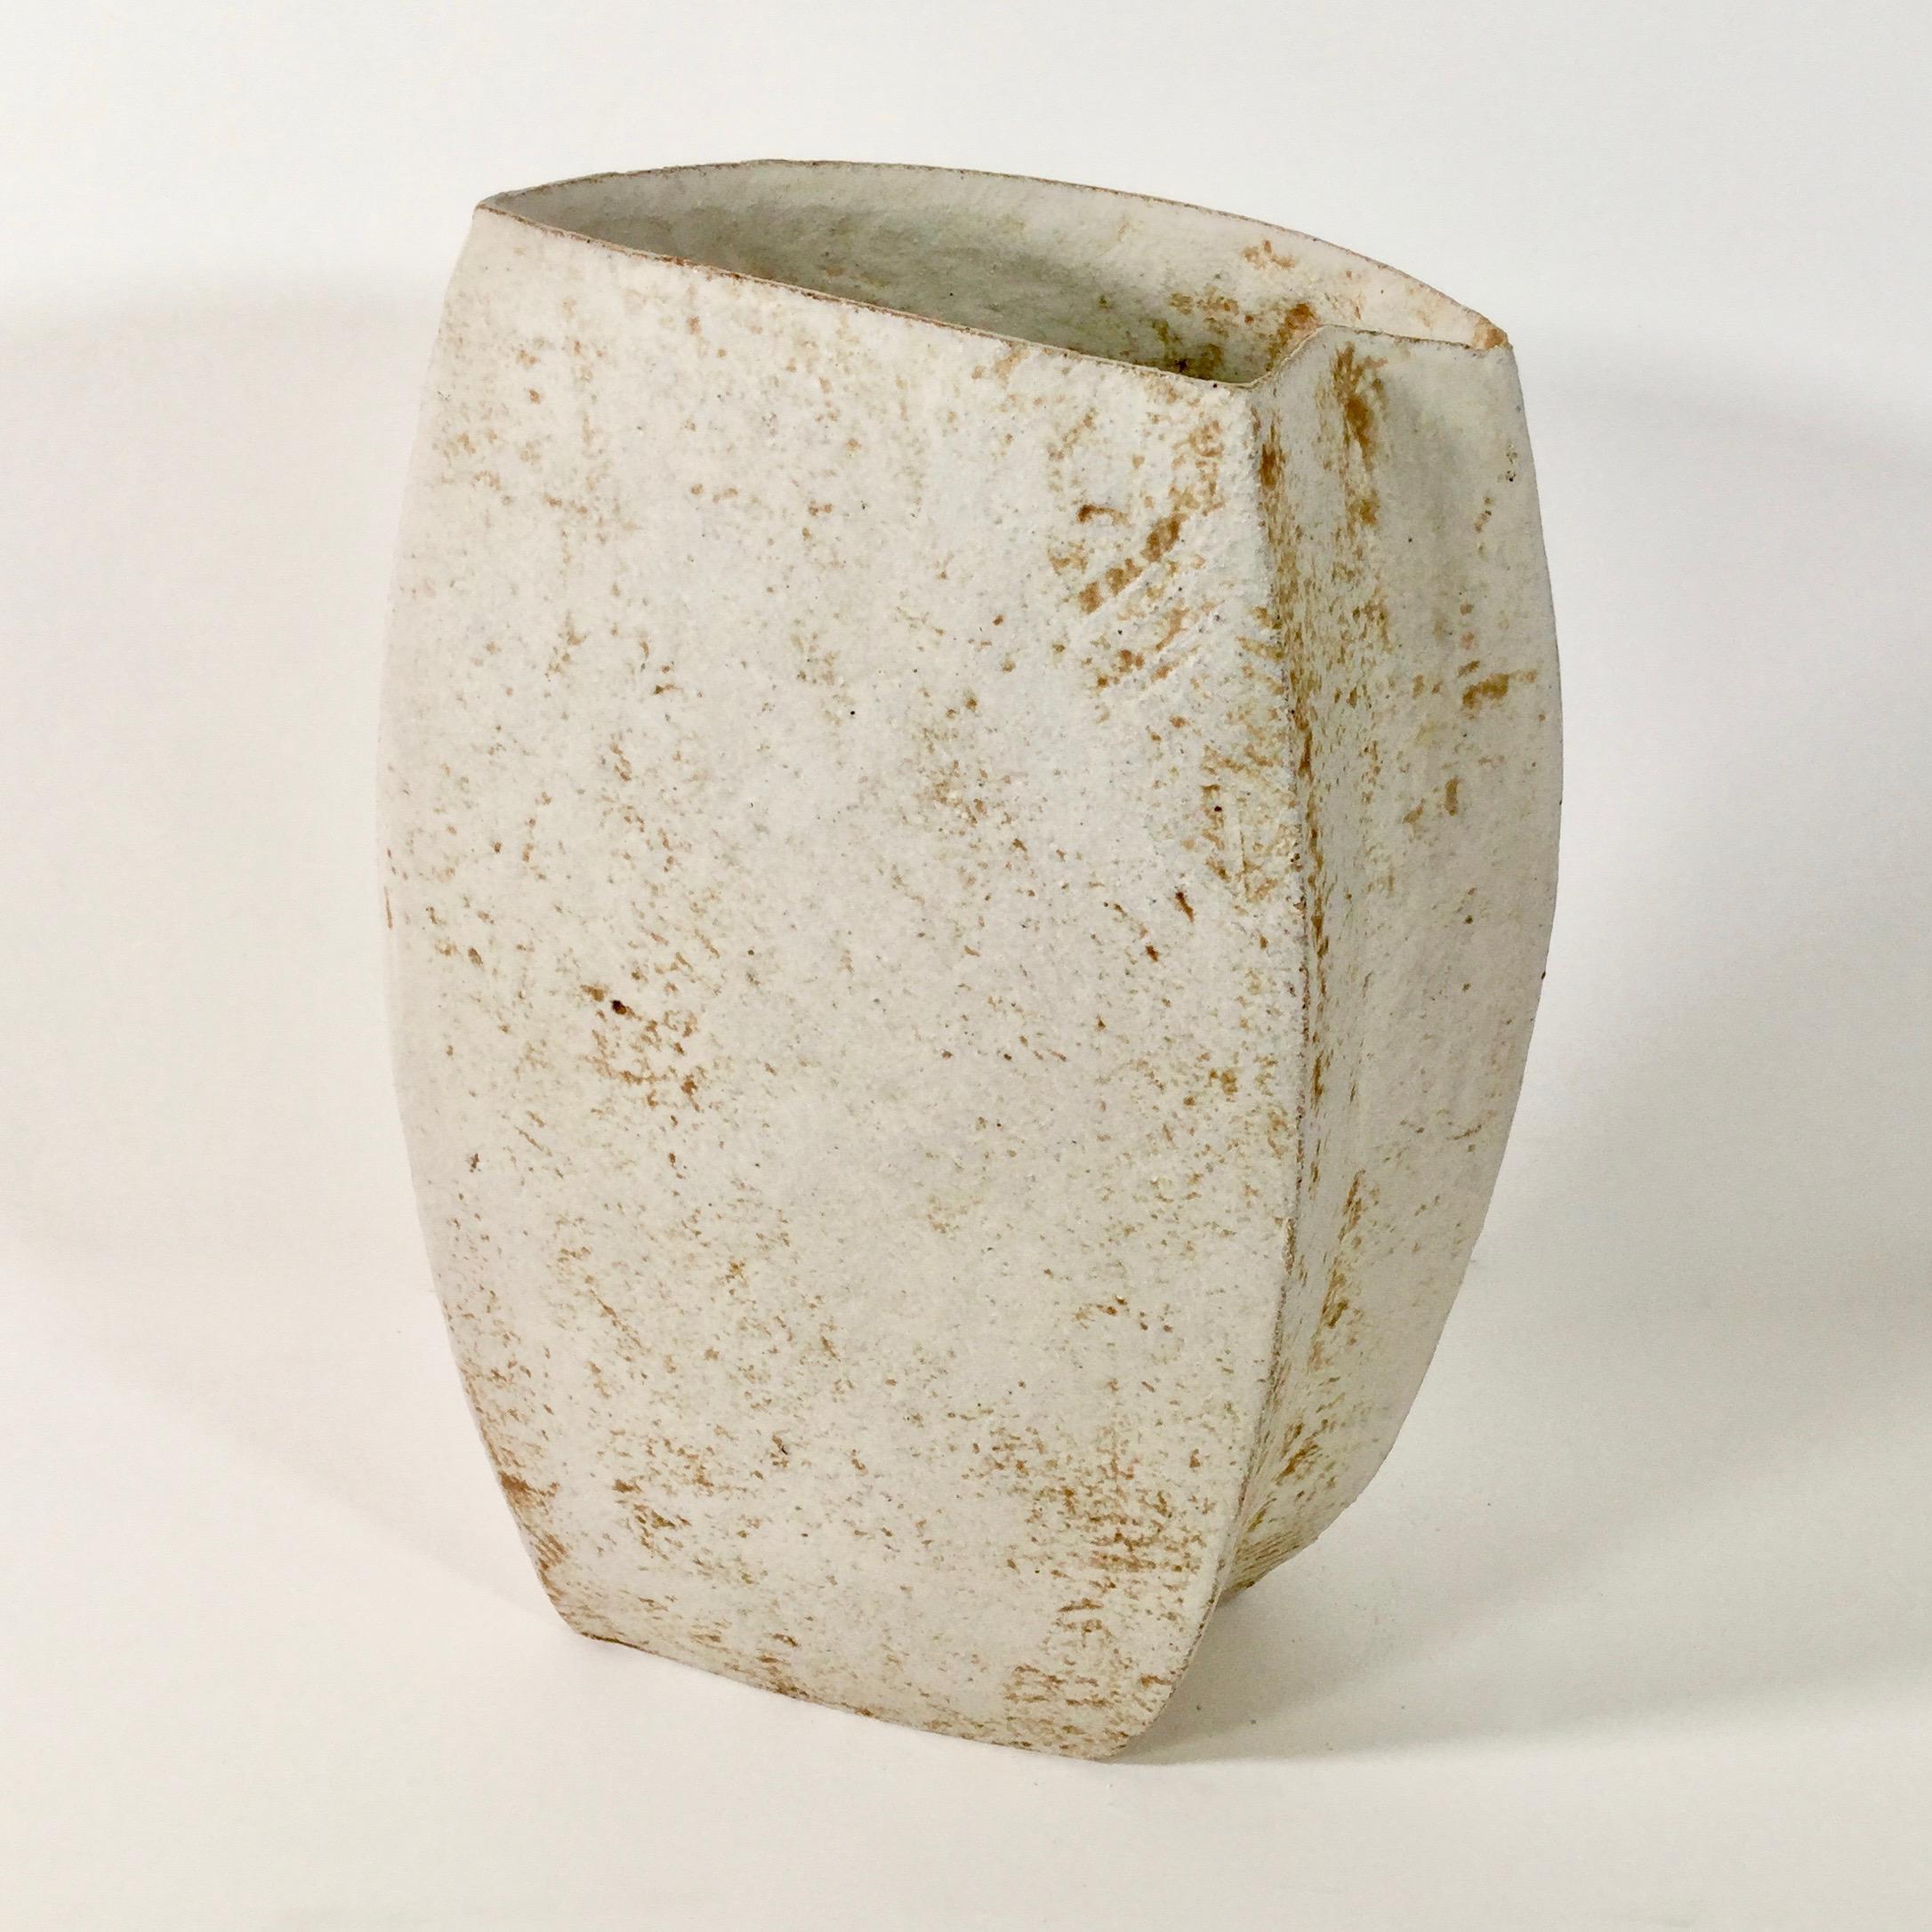 Paul Philp, Freeform Vessel I. Stoneware, ceramic, light, white, cream, chalky